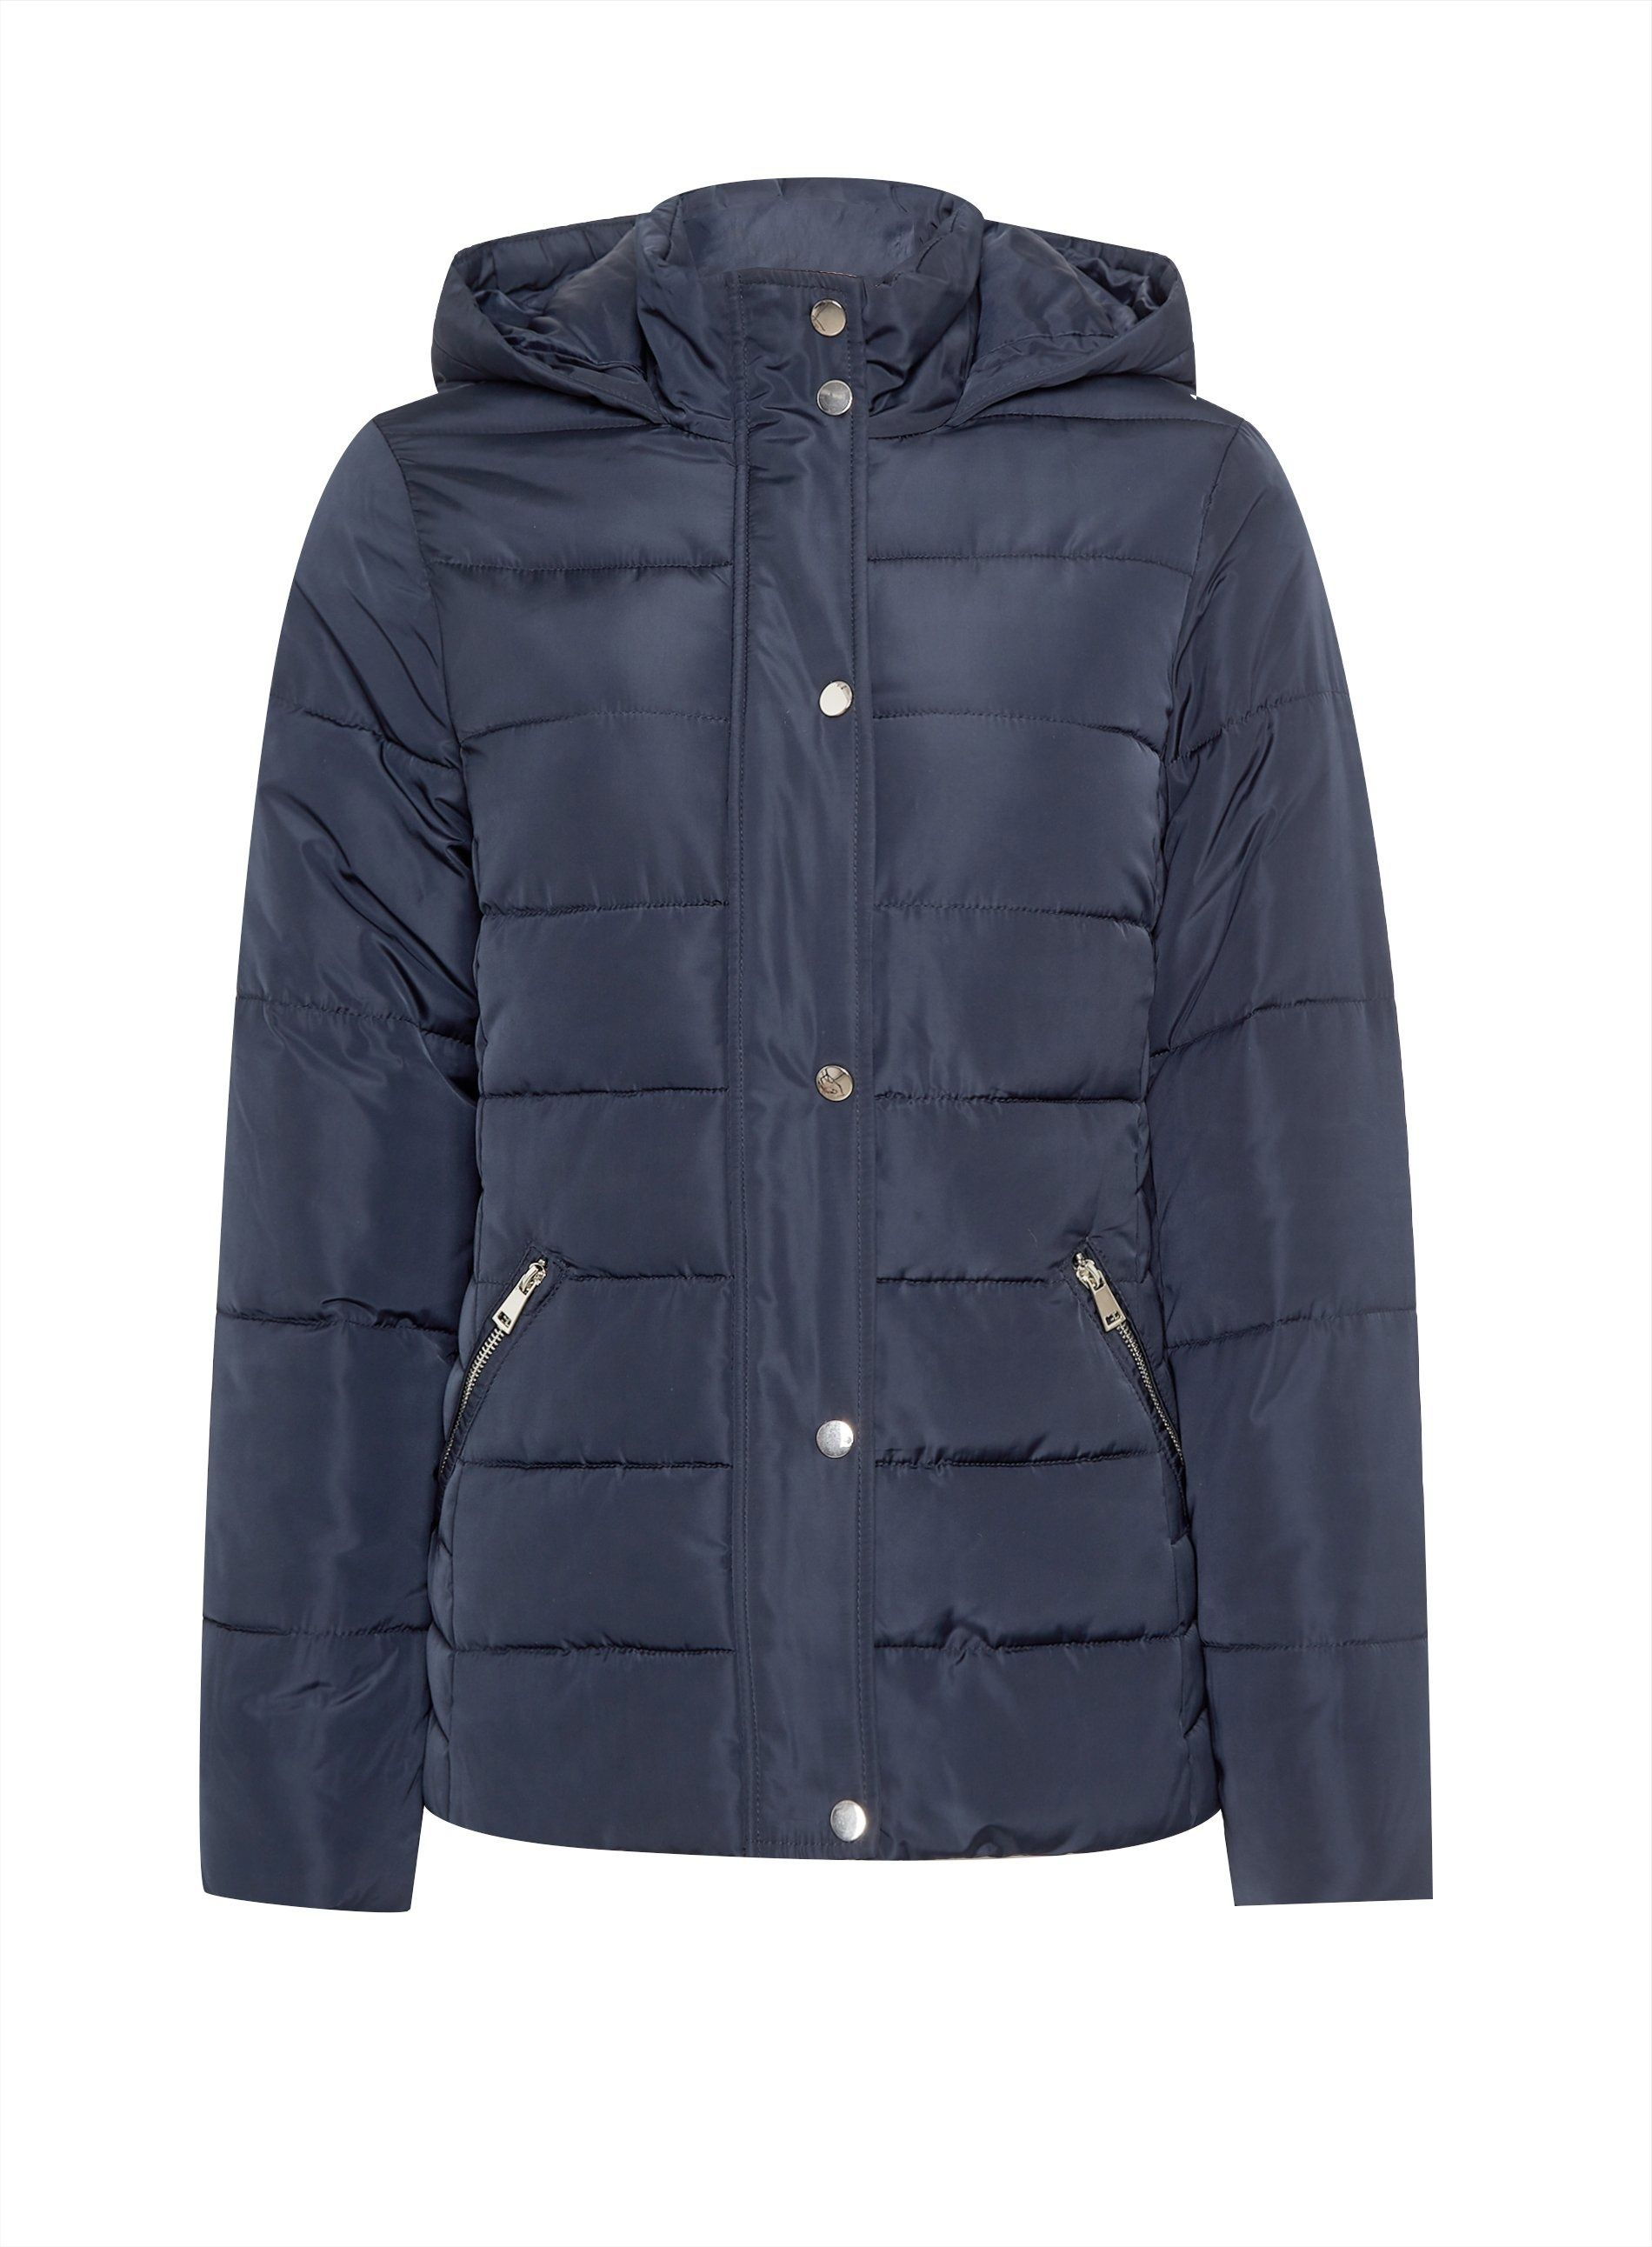 Dorothy Perkins Womens Navy Short Padded Coat Jacket Winter Warm Zip Outerwear